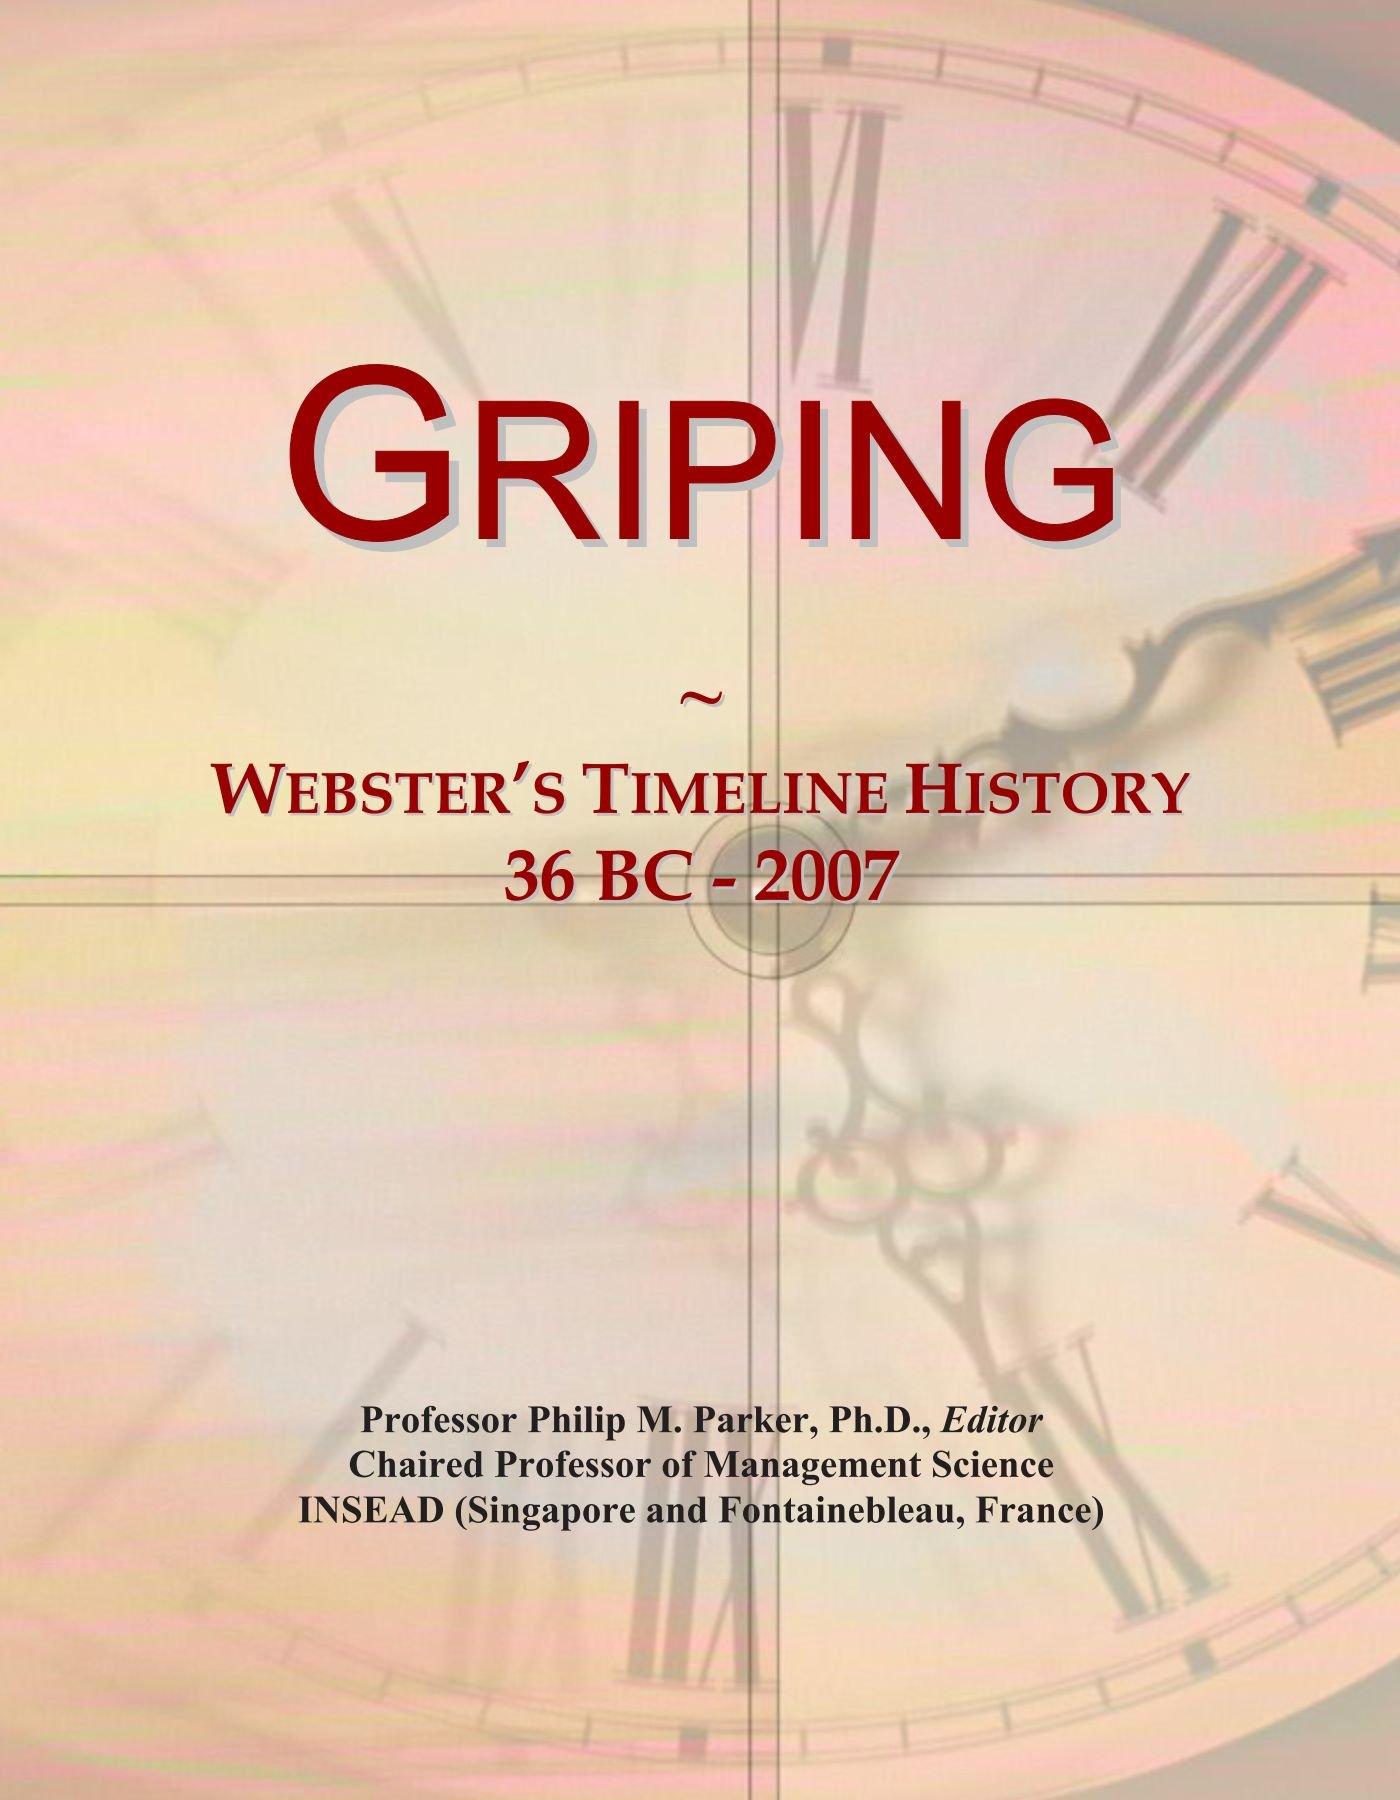 Download Griping: Webster's Timeline History, 36 BC - 2007 ebook